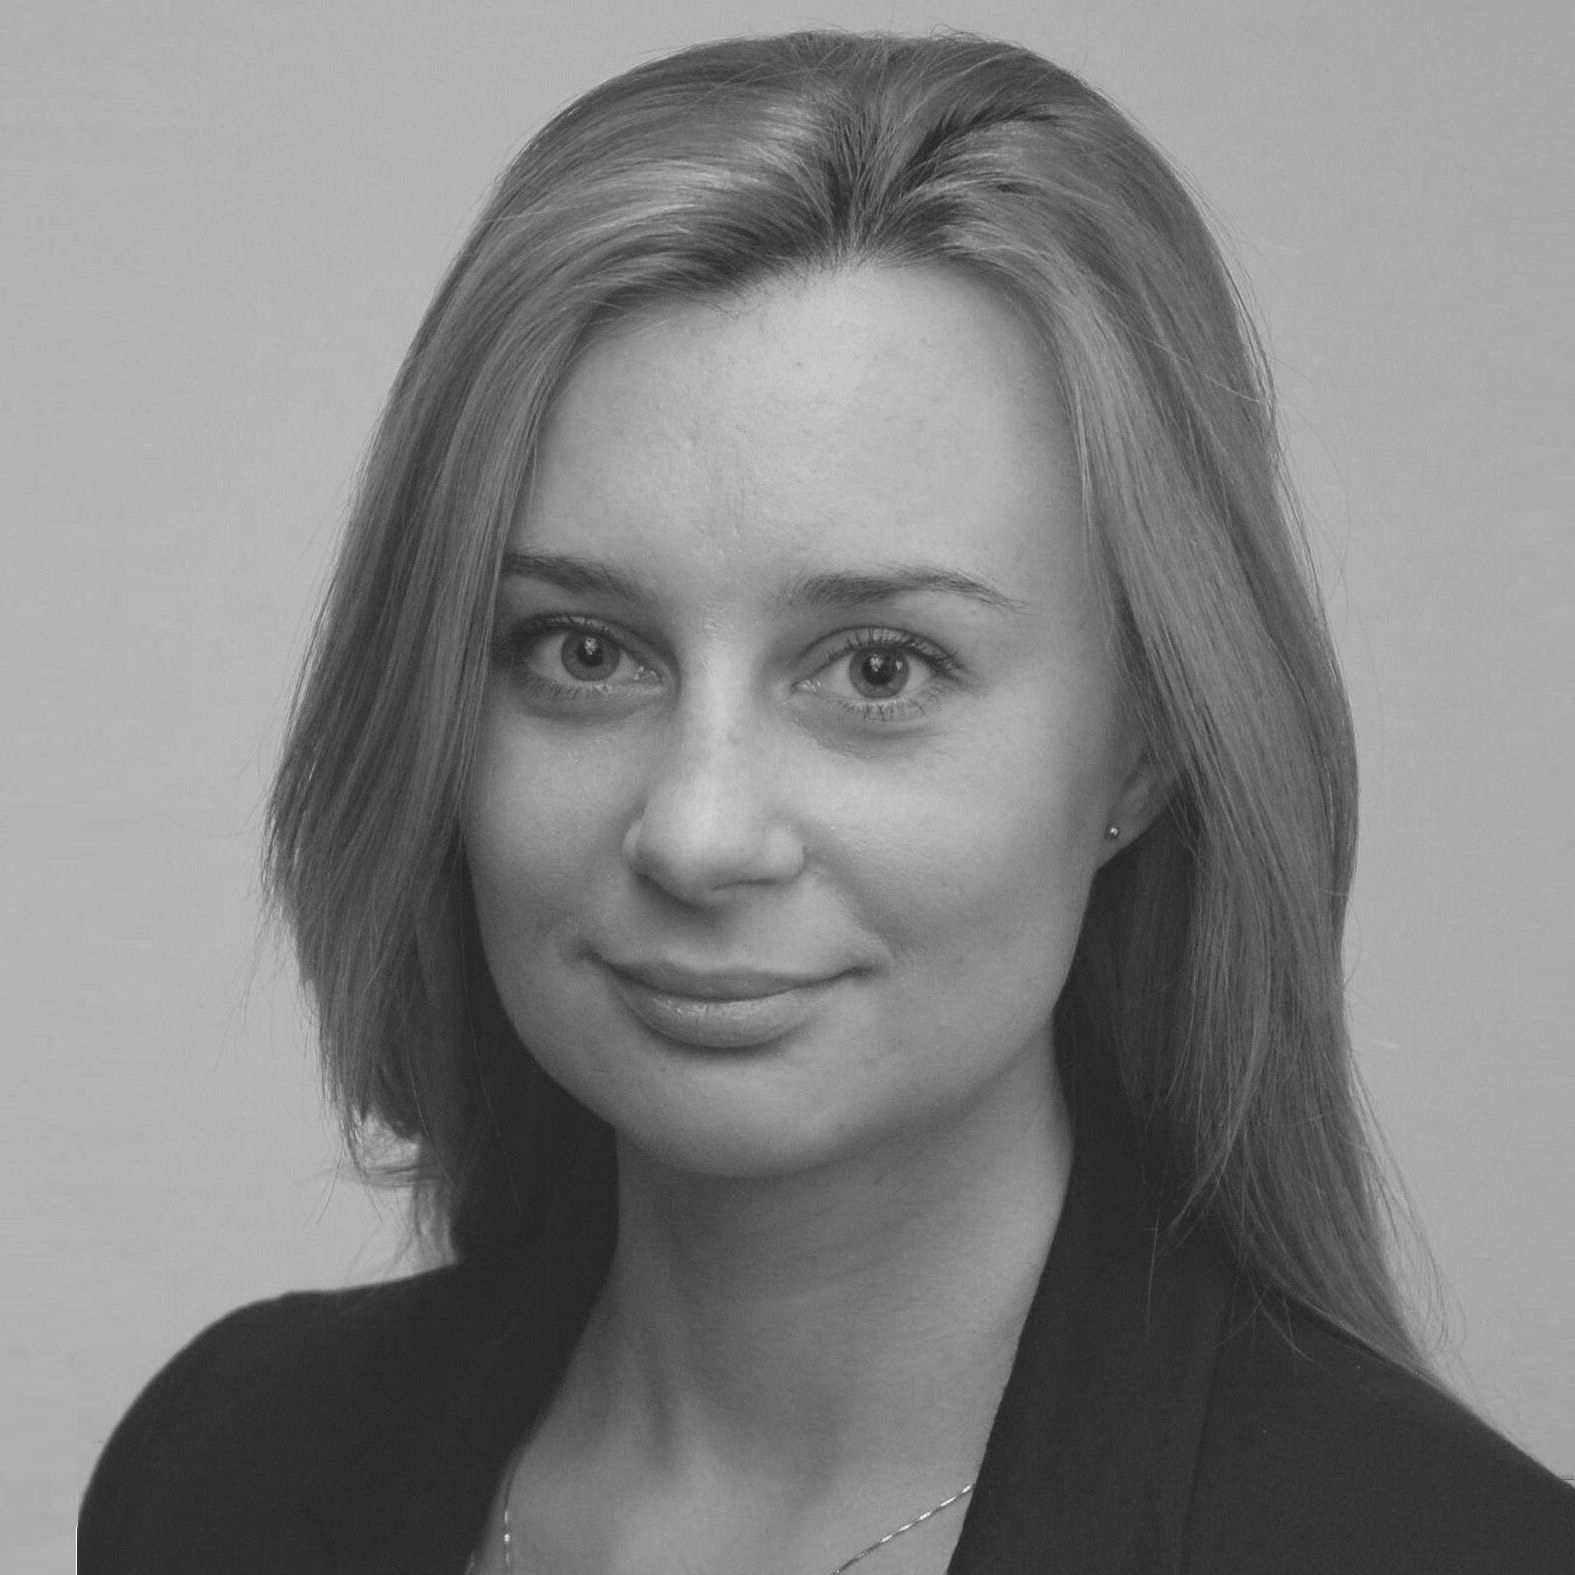 Weronika Boroń